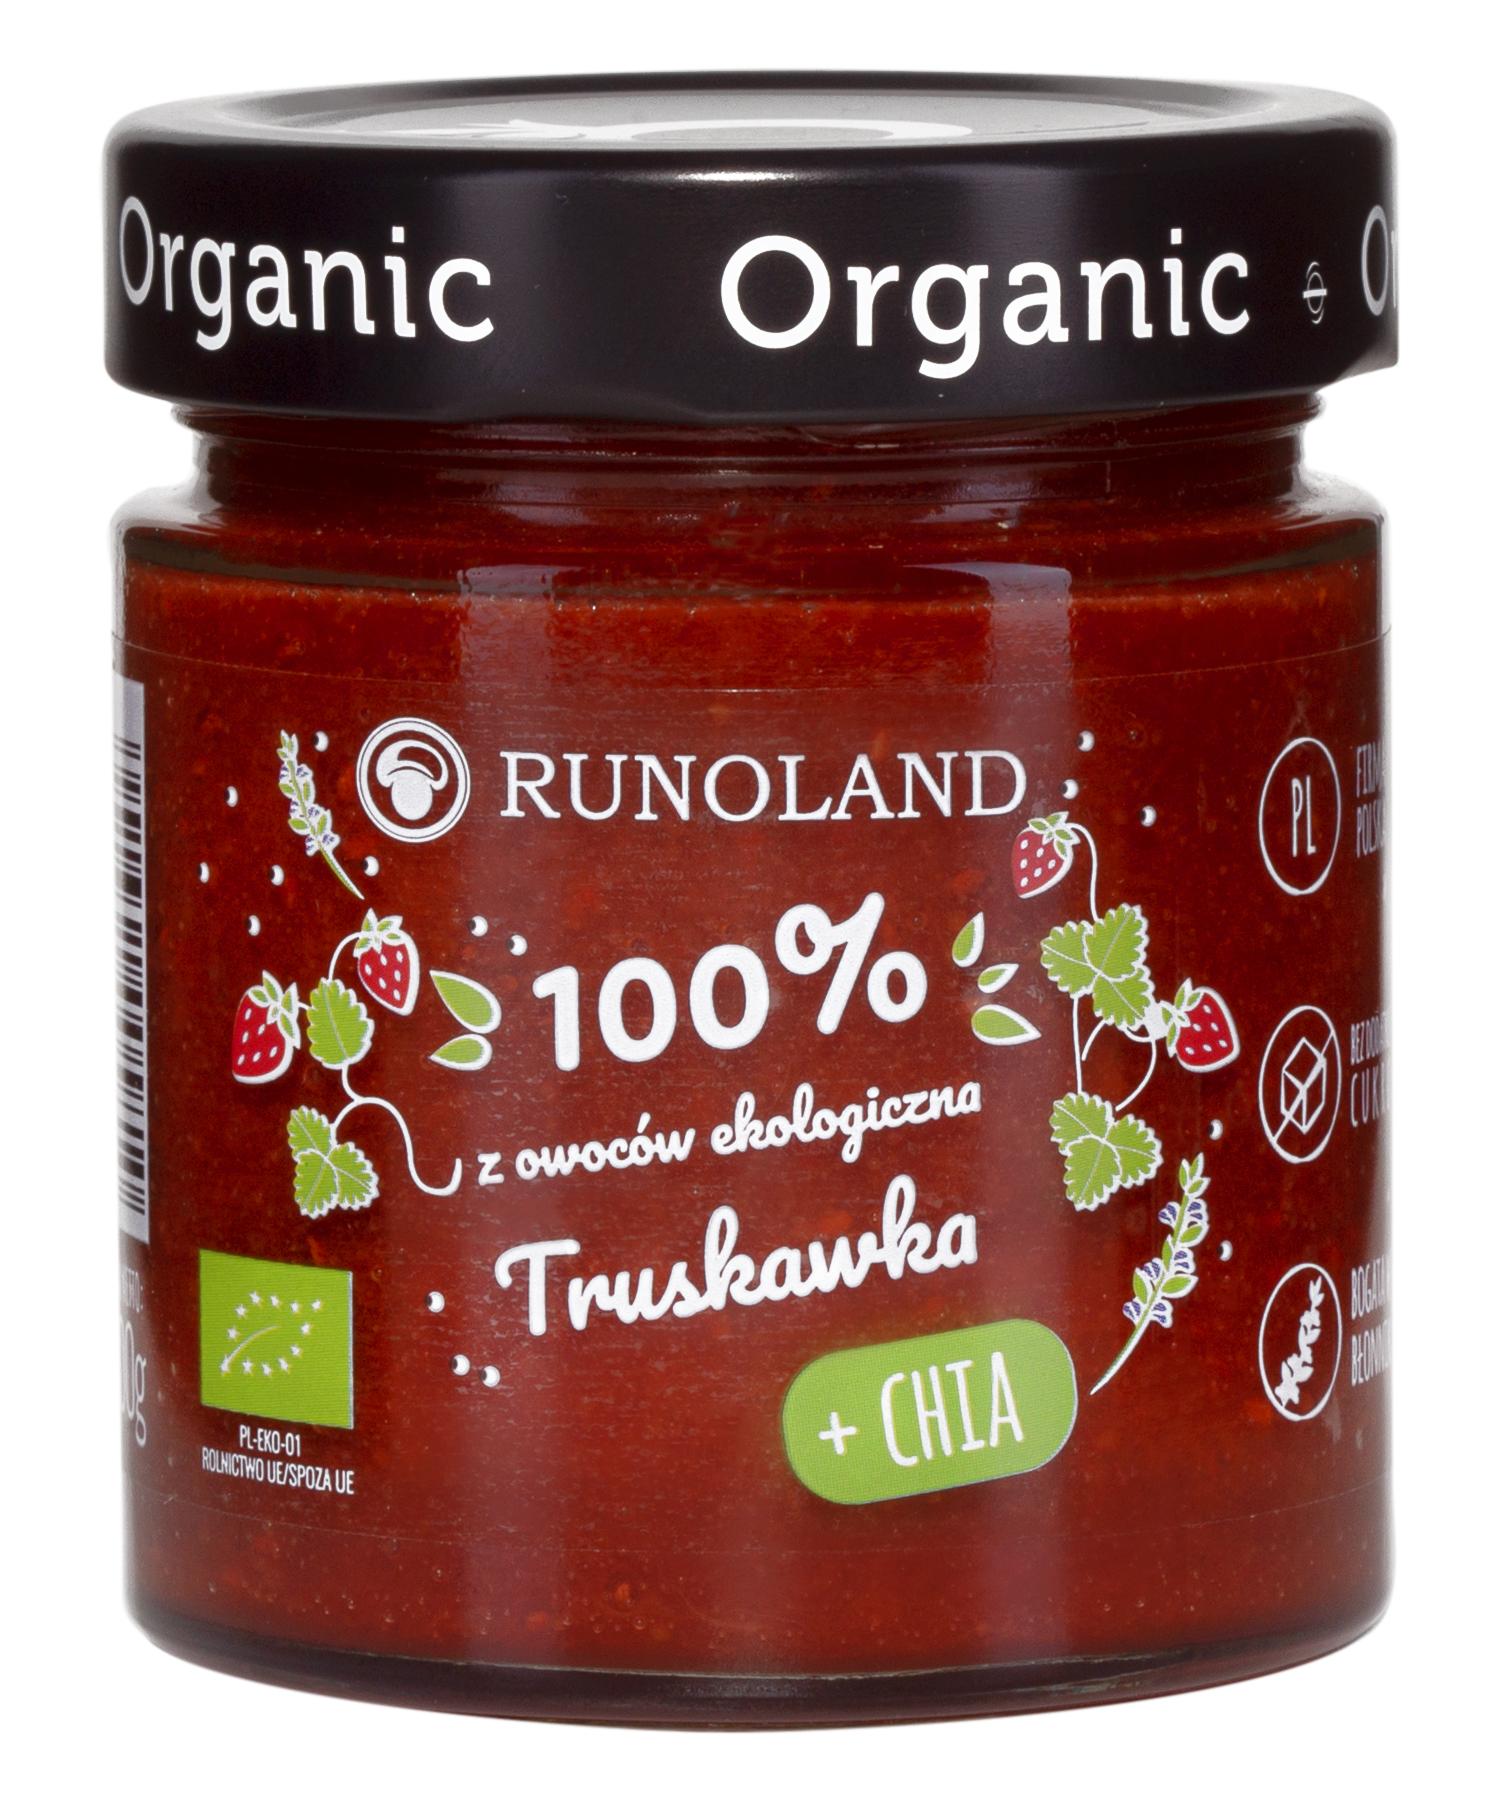 Runoland - 100% ekologiczna truskawka z nasionami chia